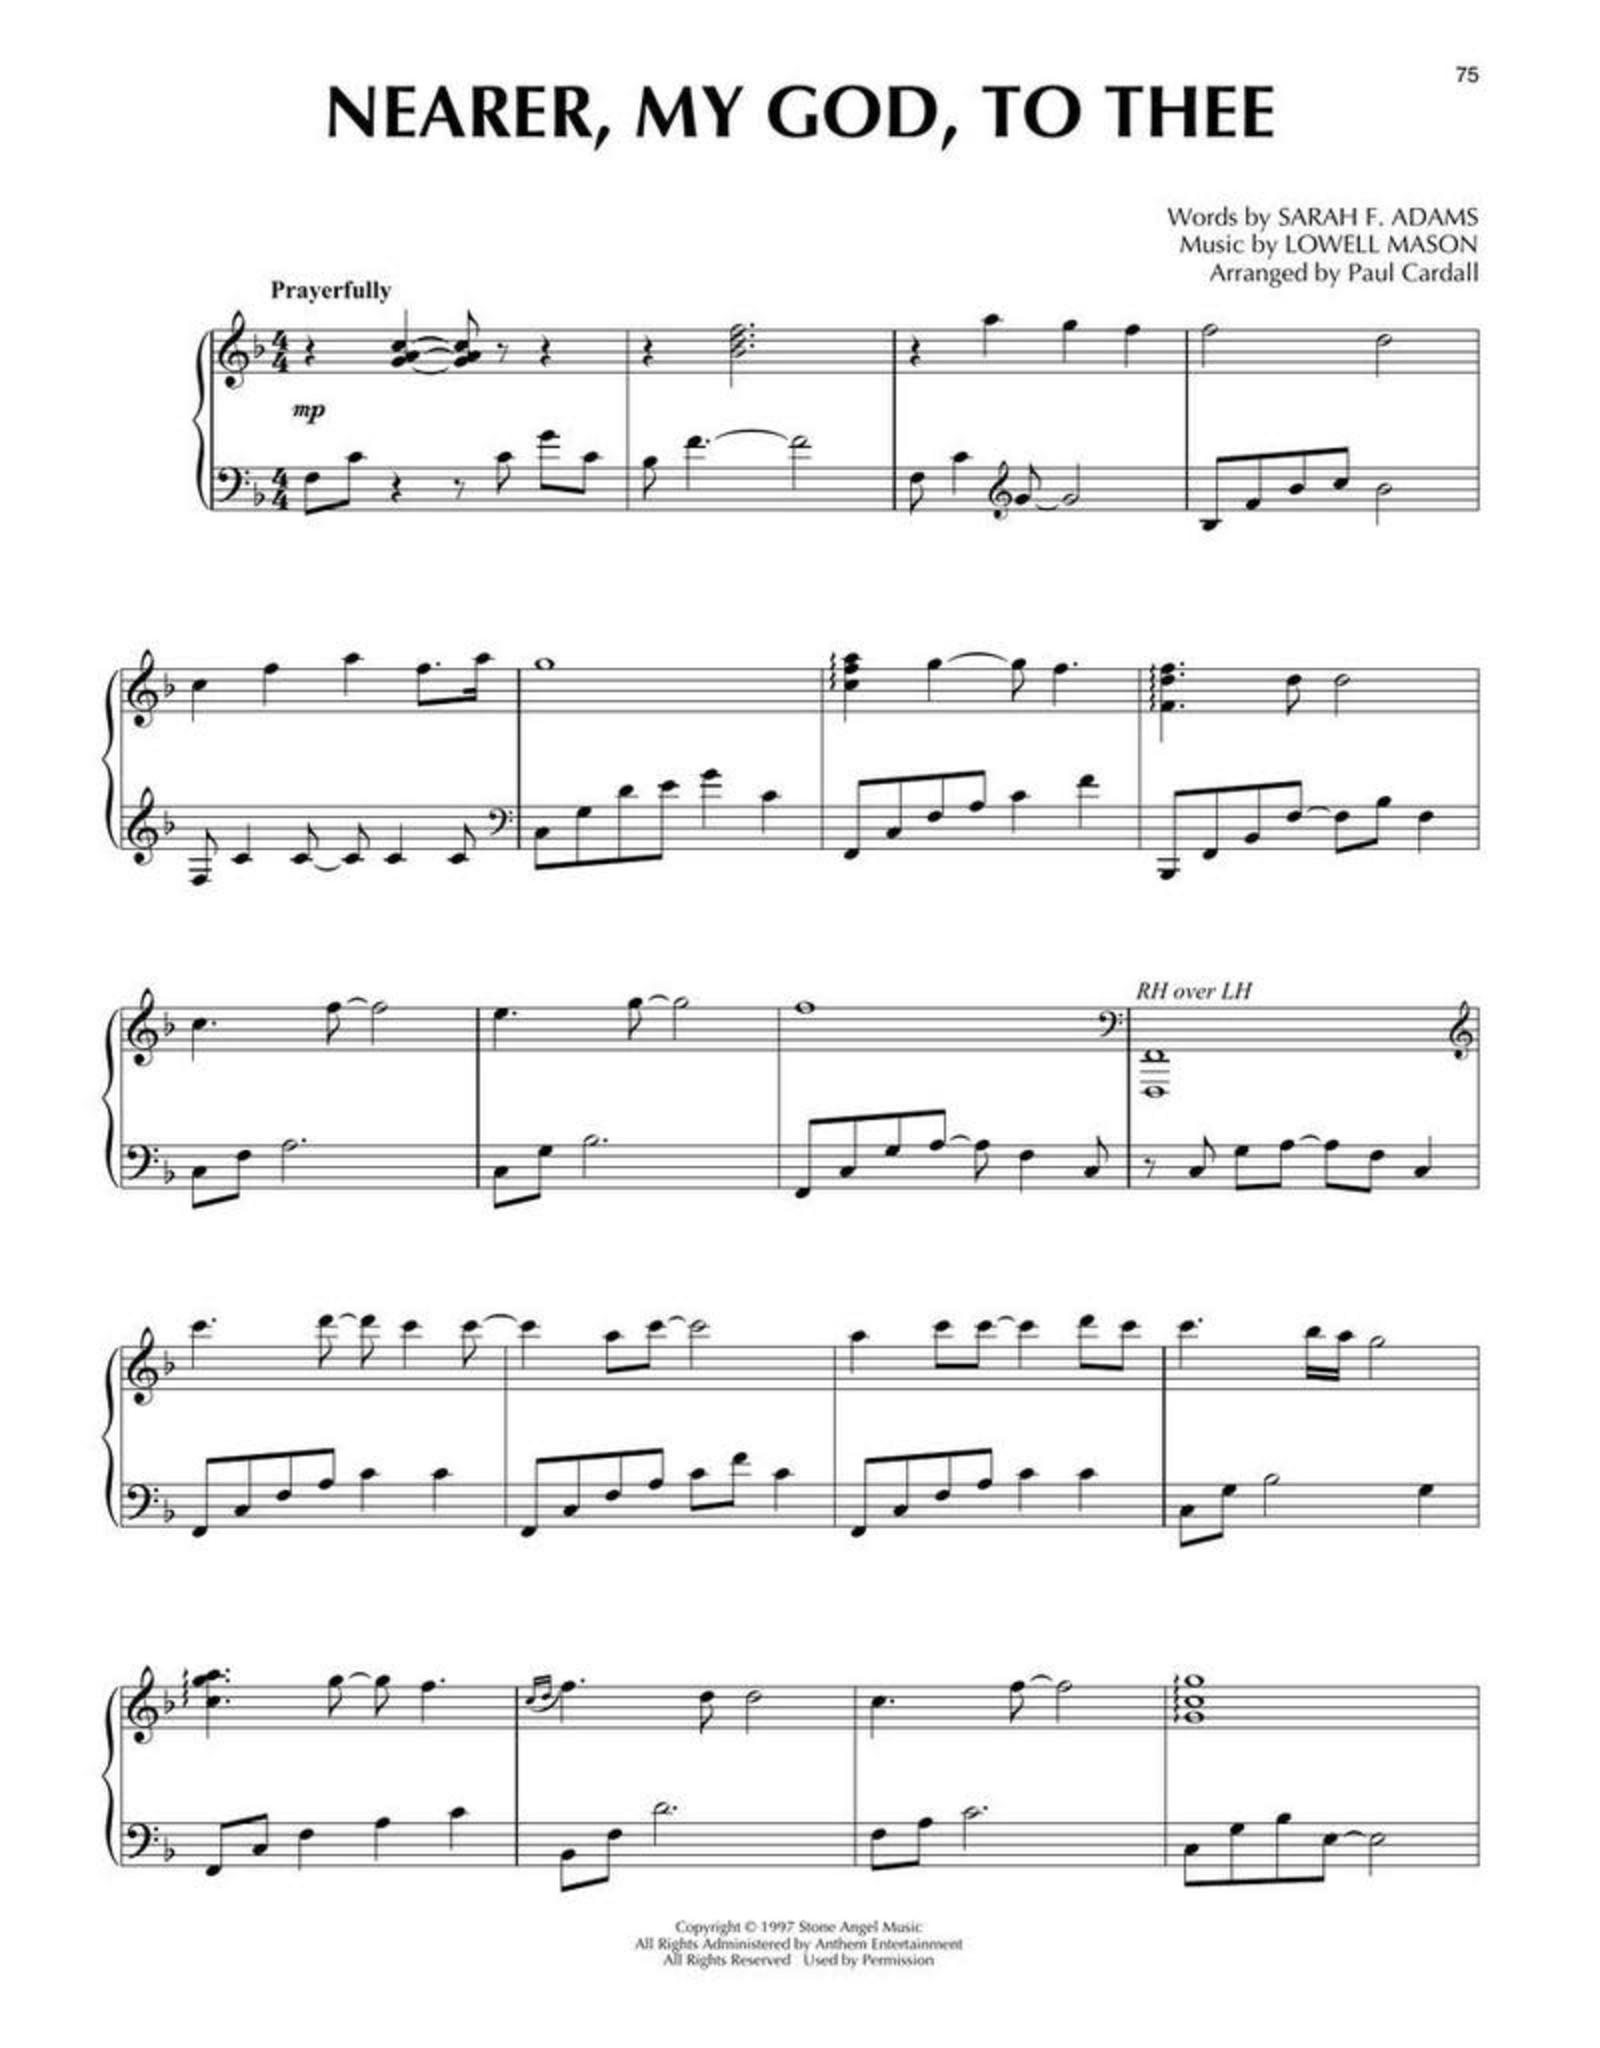 Hal Leonard Paul Cardall - Hymns Collection - 29 Hymn Arrangements